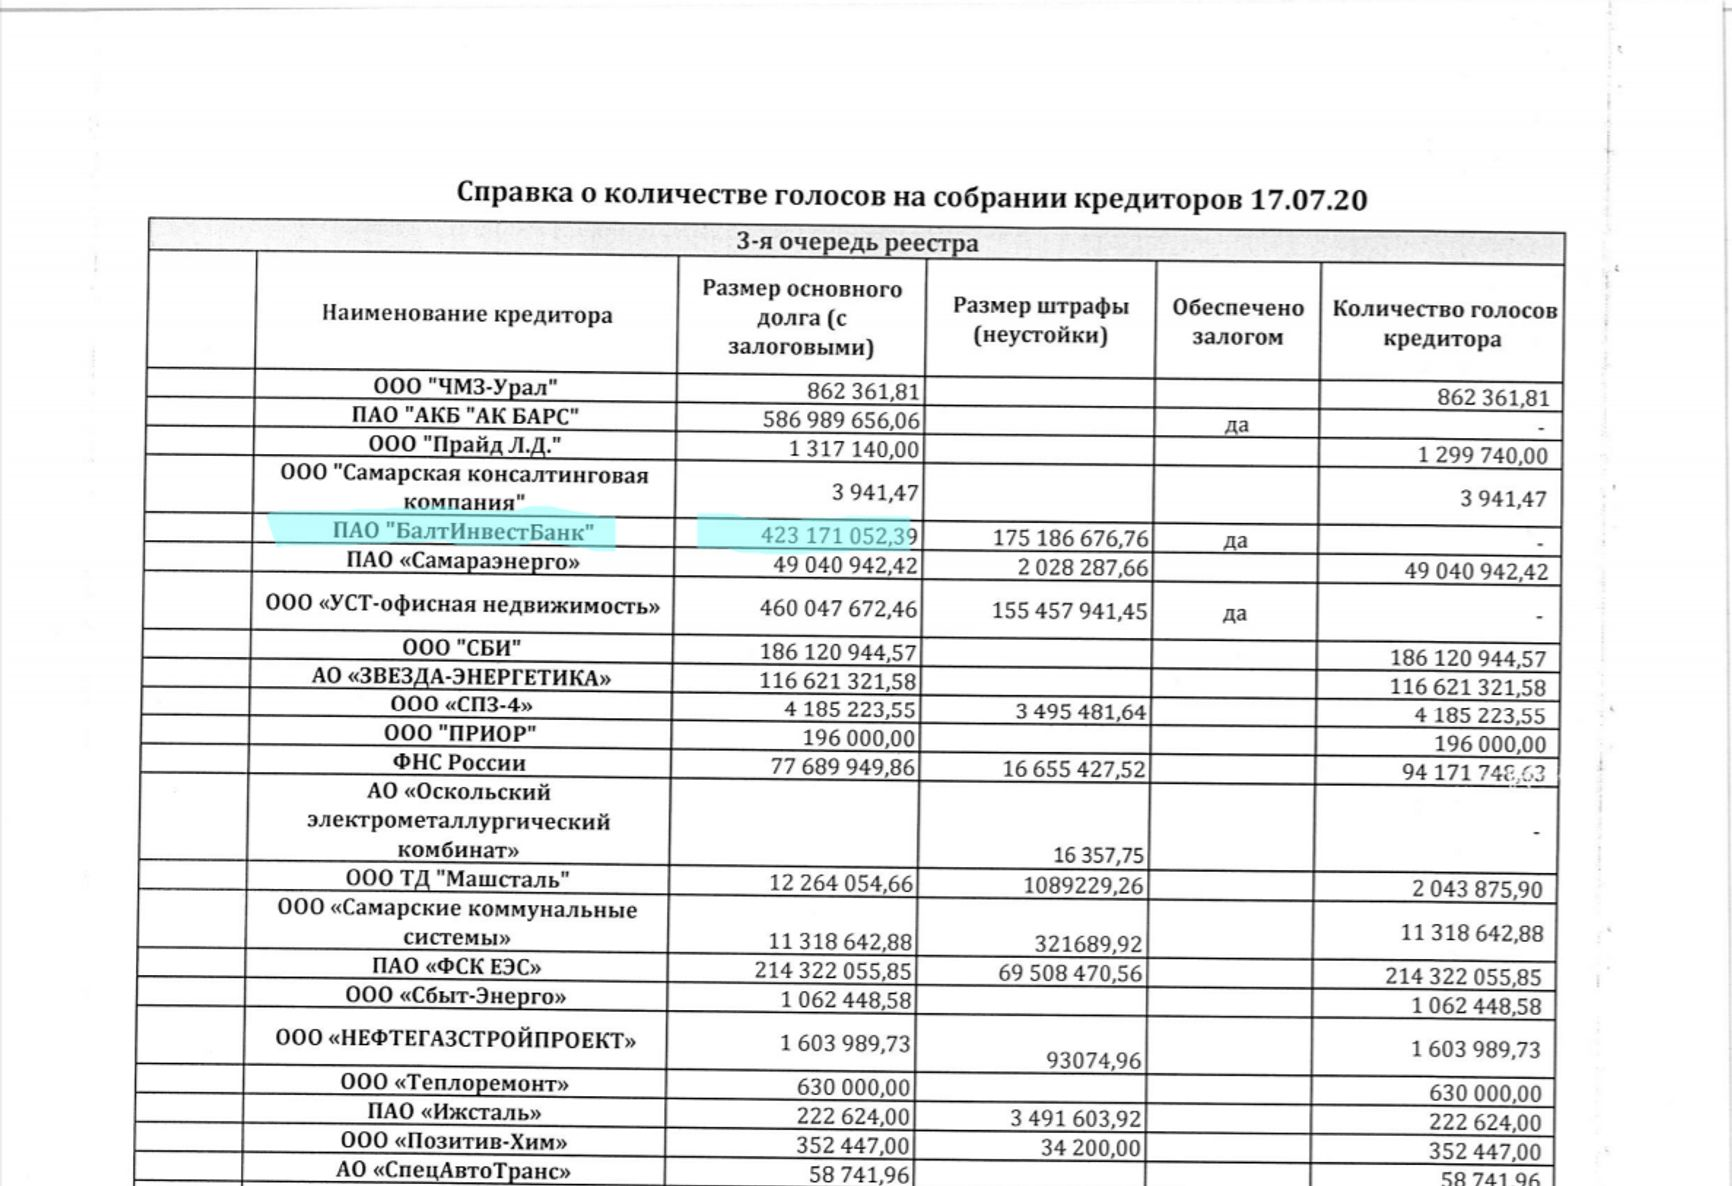 СПЗ должен только Балтинвестбанку почти полмиллиарда рублей